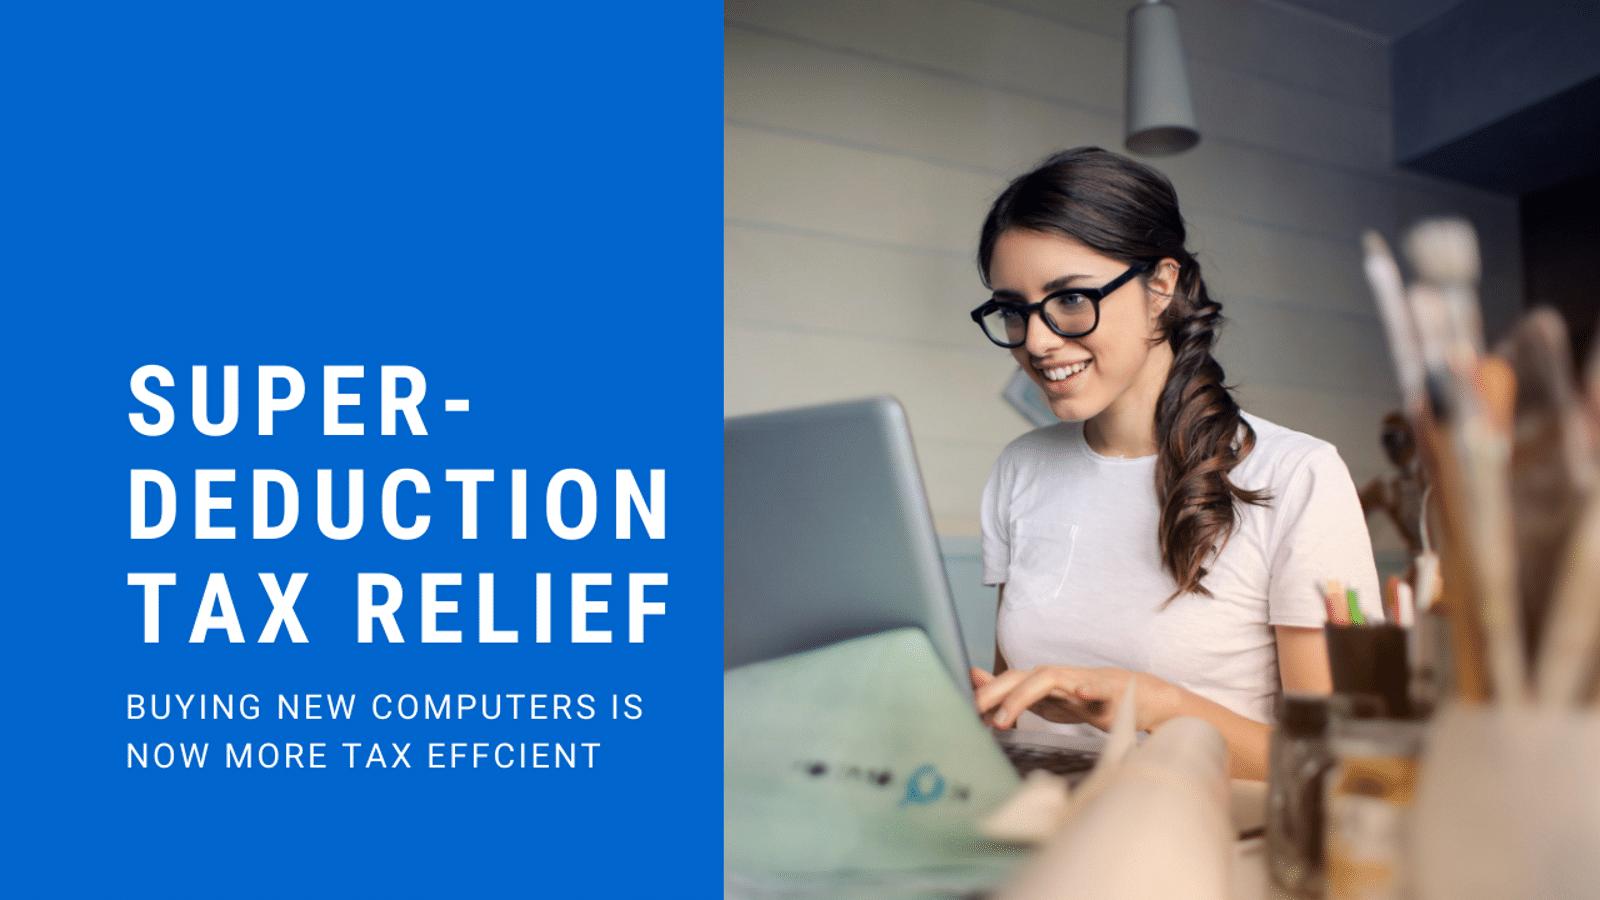 Super-deduction Tax Relief